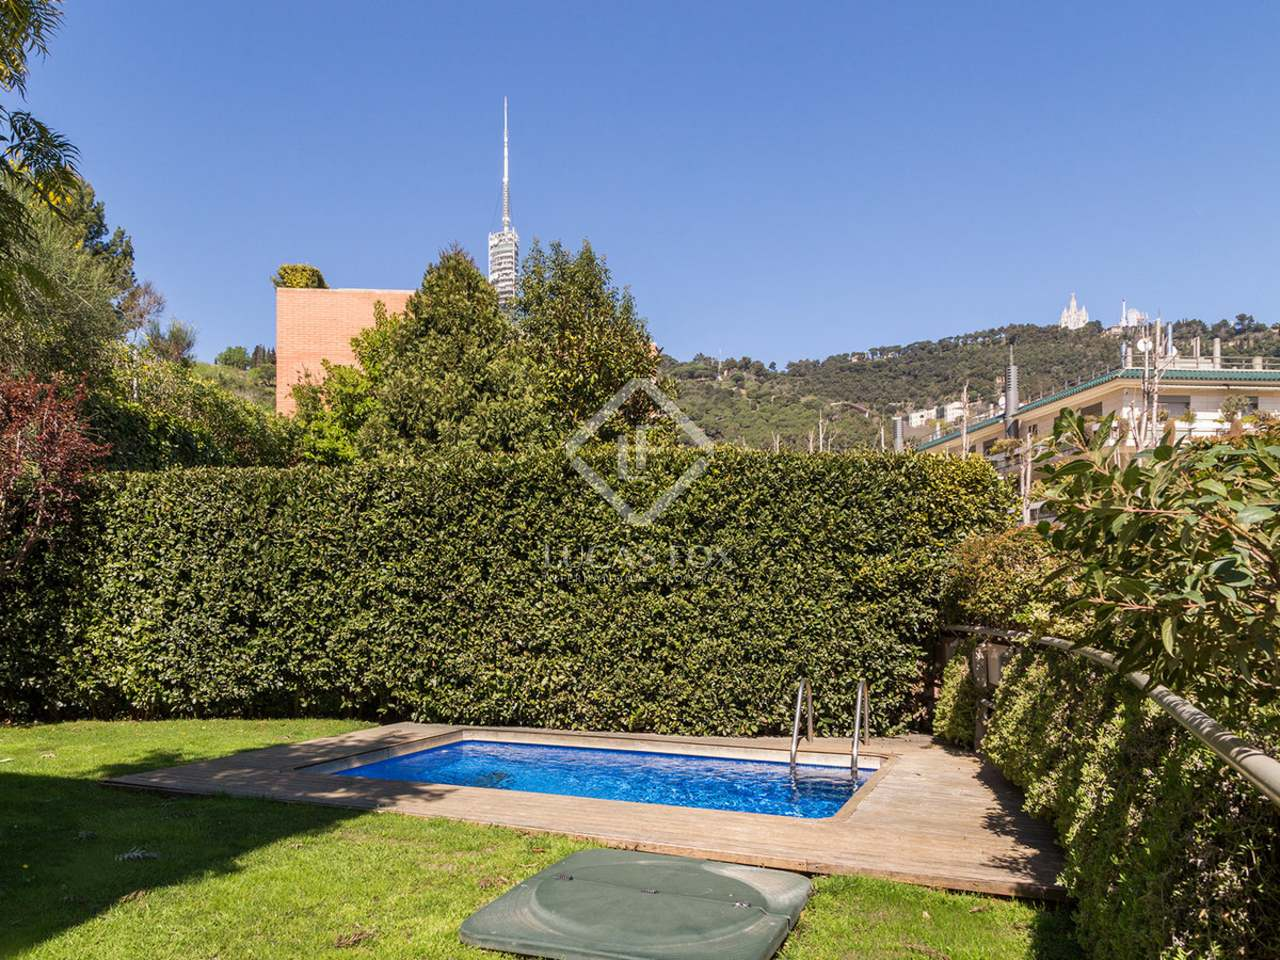 Bonita casa en alquiler en la zona alta de barcelona for Casa alquiler barcelona jardin